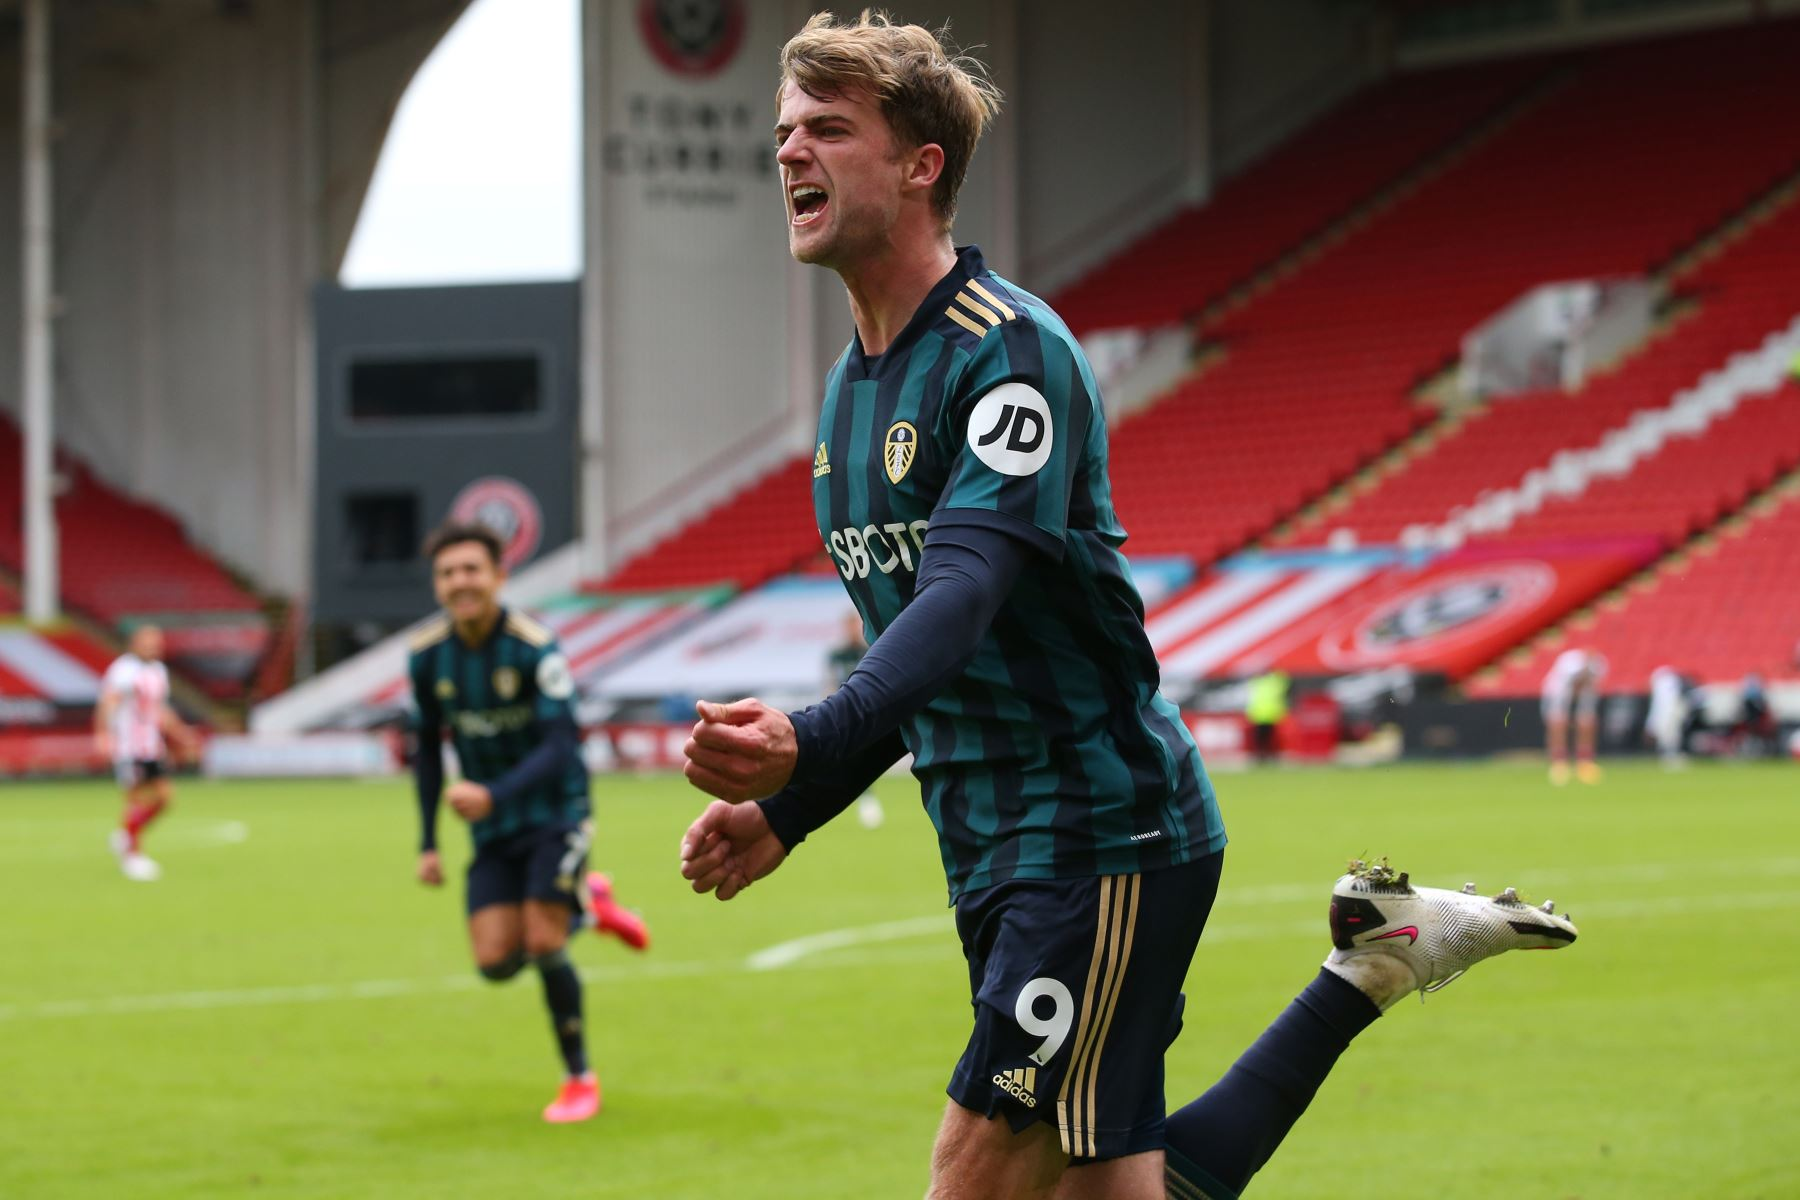 El delantero inglés del Leeds United, Patrick Bamford, celebra después de anotar el gol de apertura del partido de fútbol de la Premier League. Foto: AFP